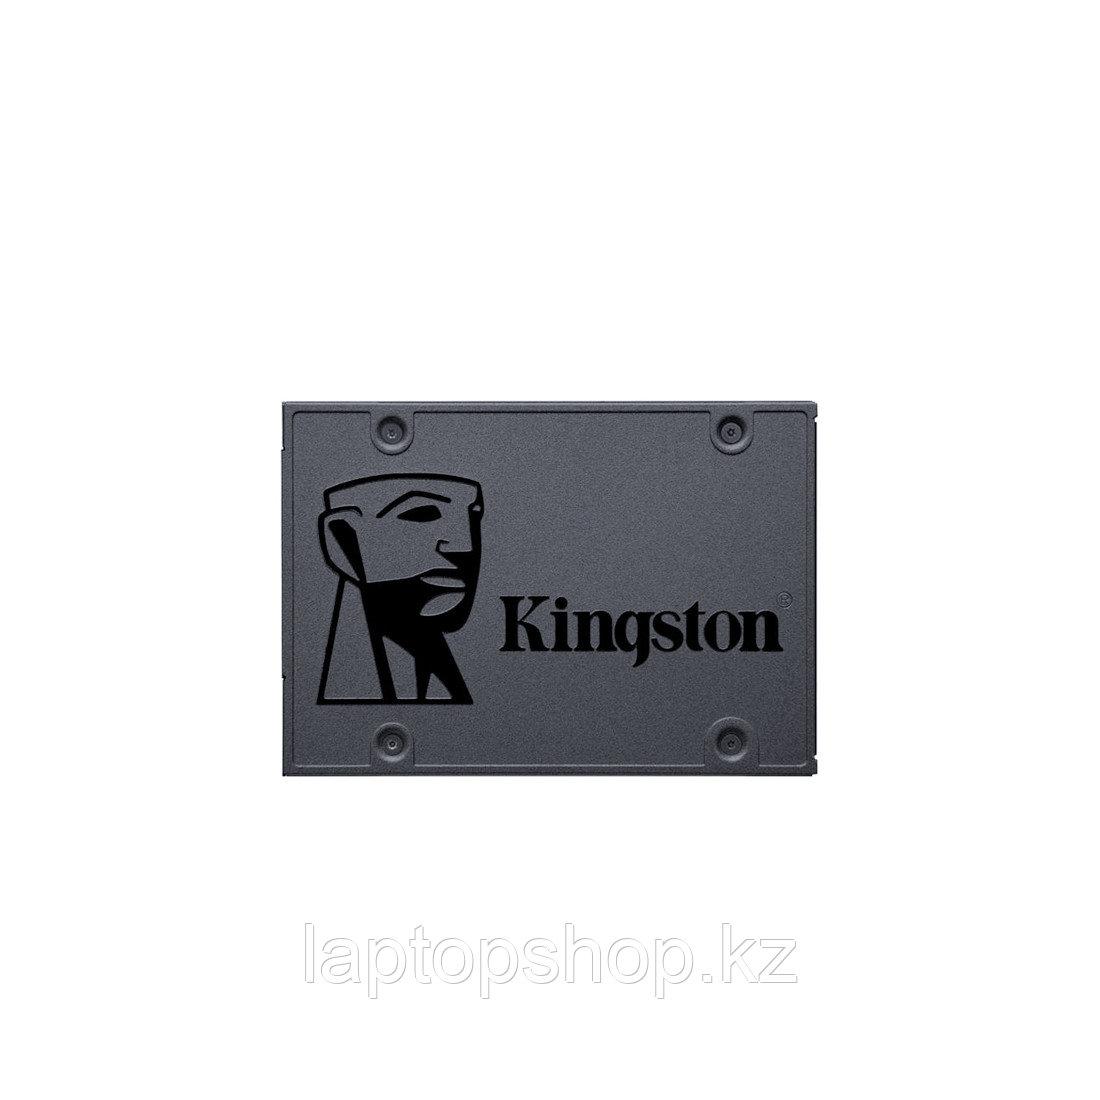 Kingston SSD 240 Gb SA400S37/240G, Sata 6Gb/s